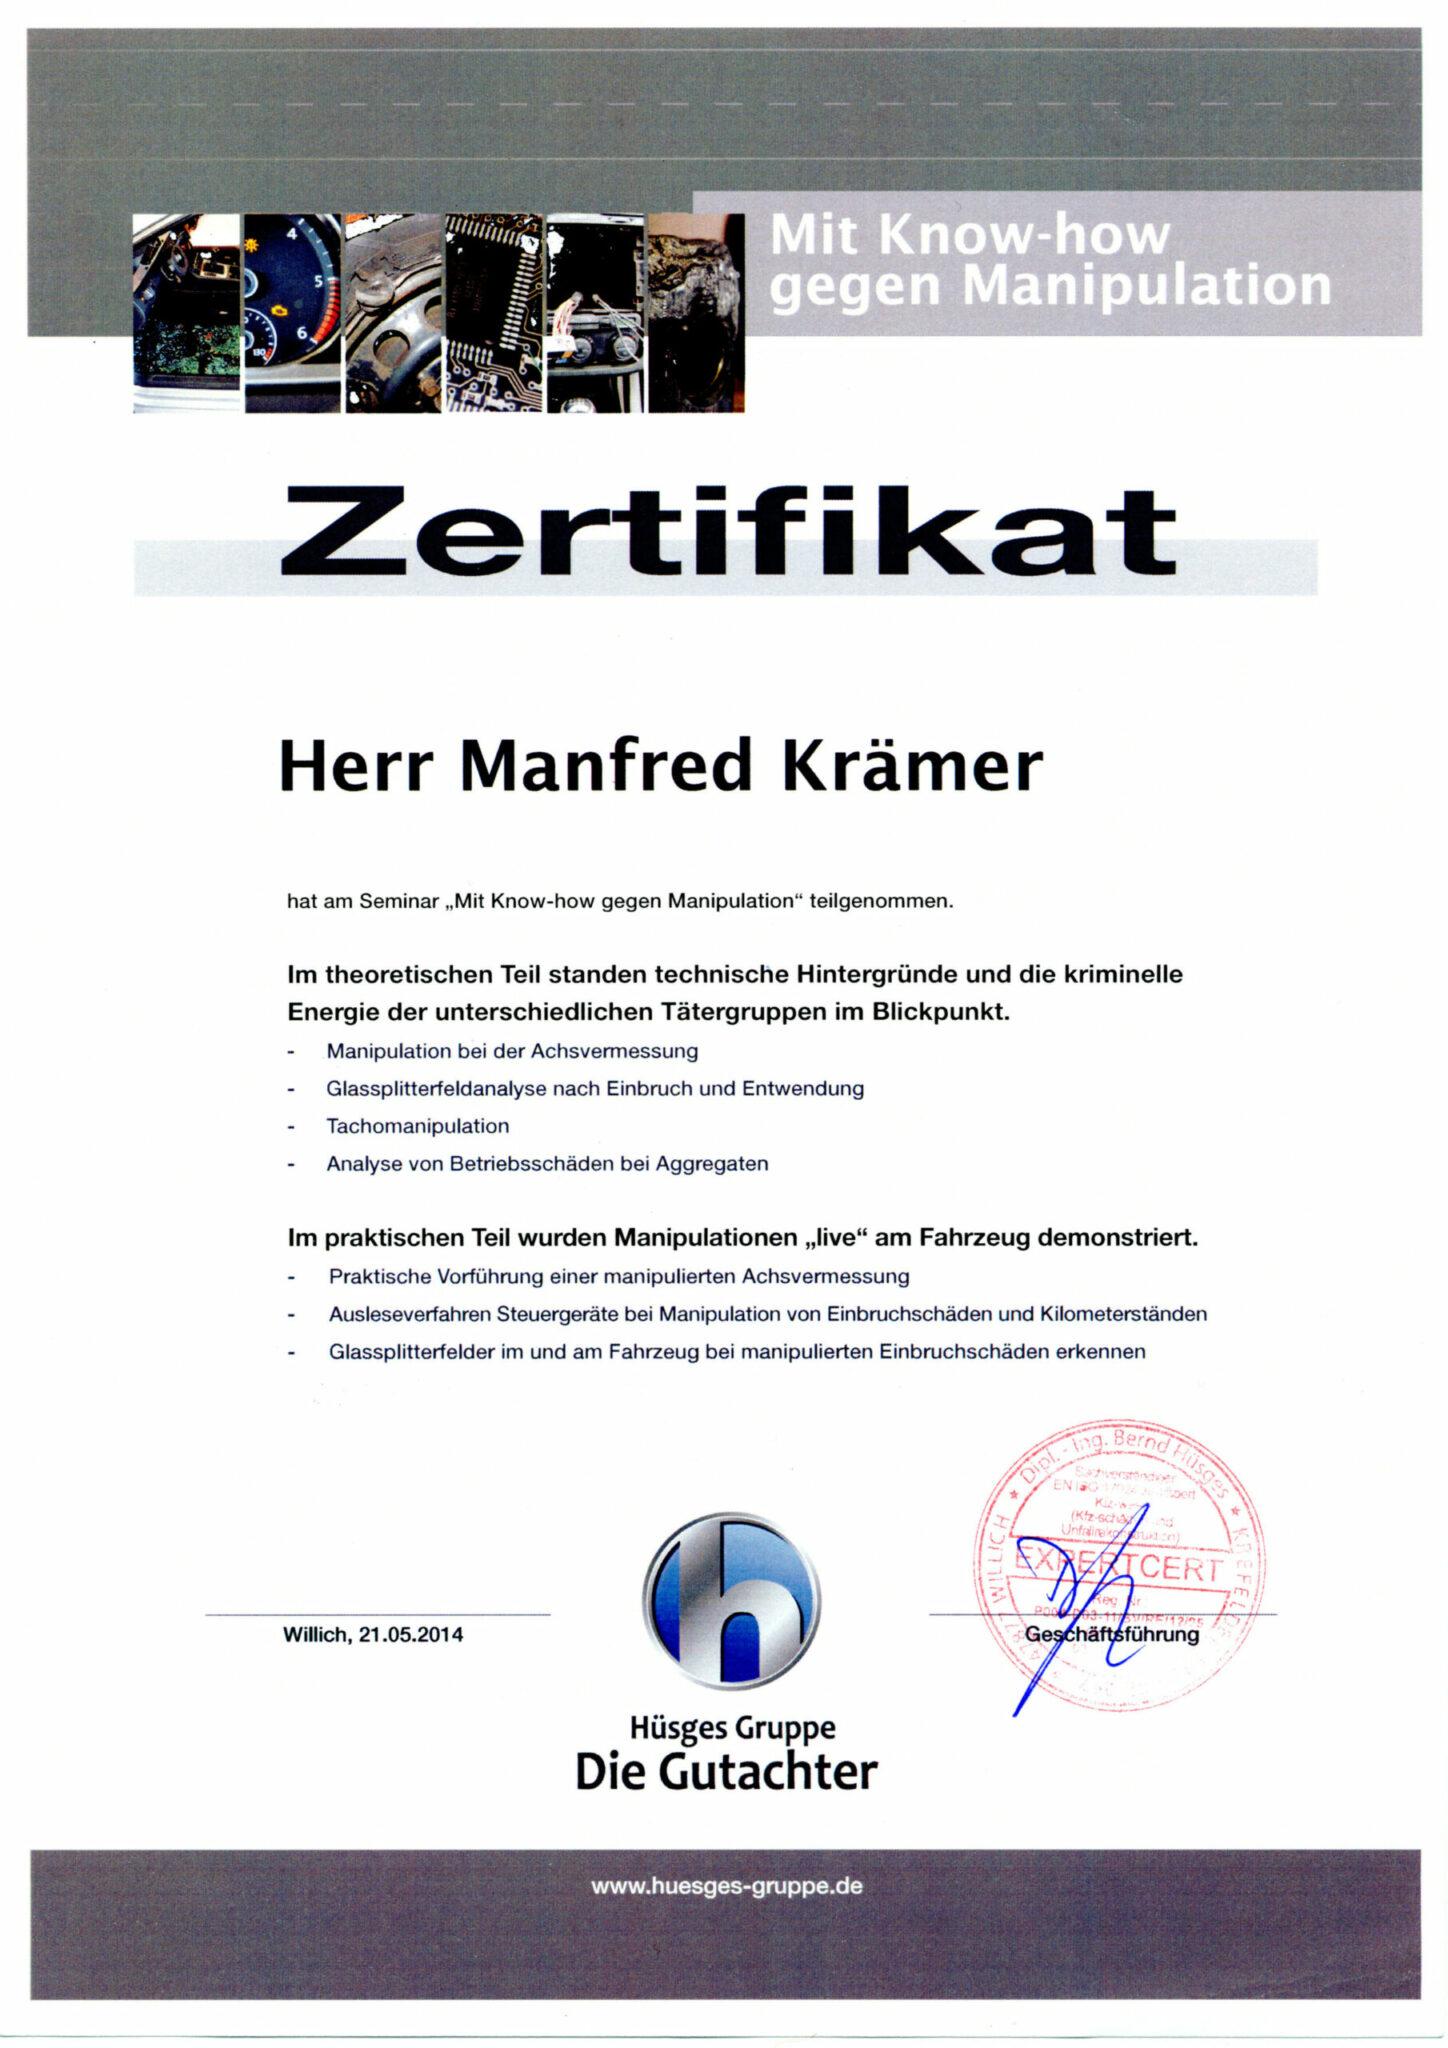 Hüsges Zertifikat 2014